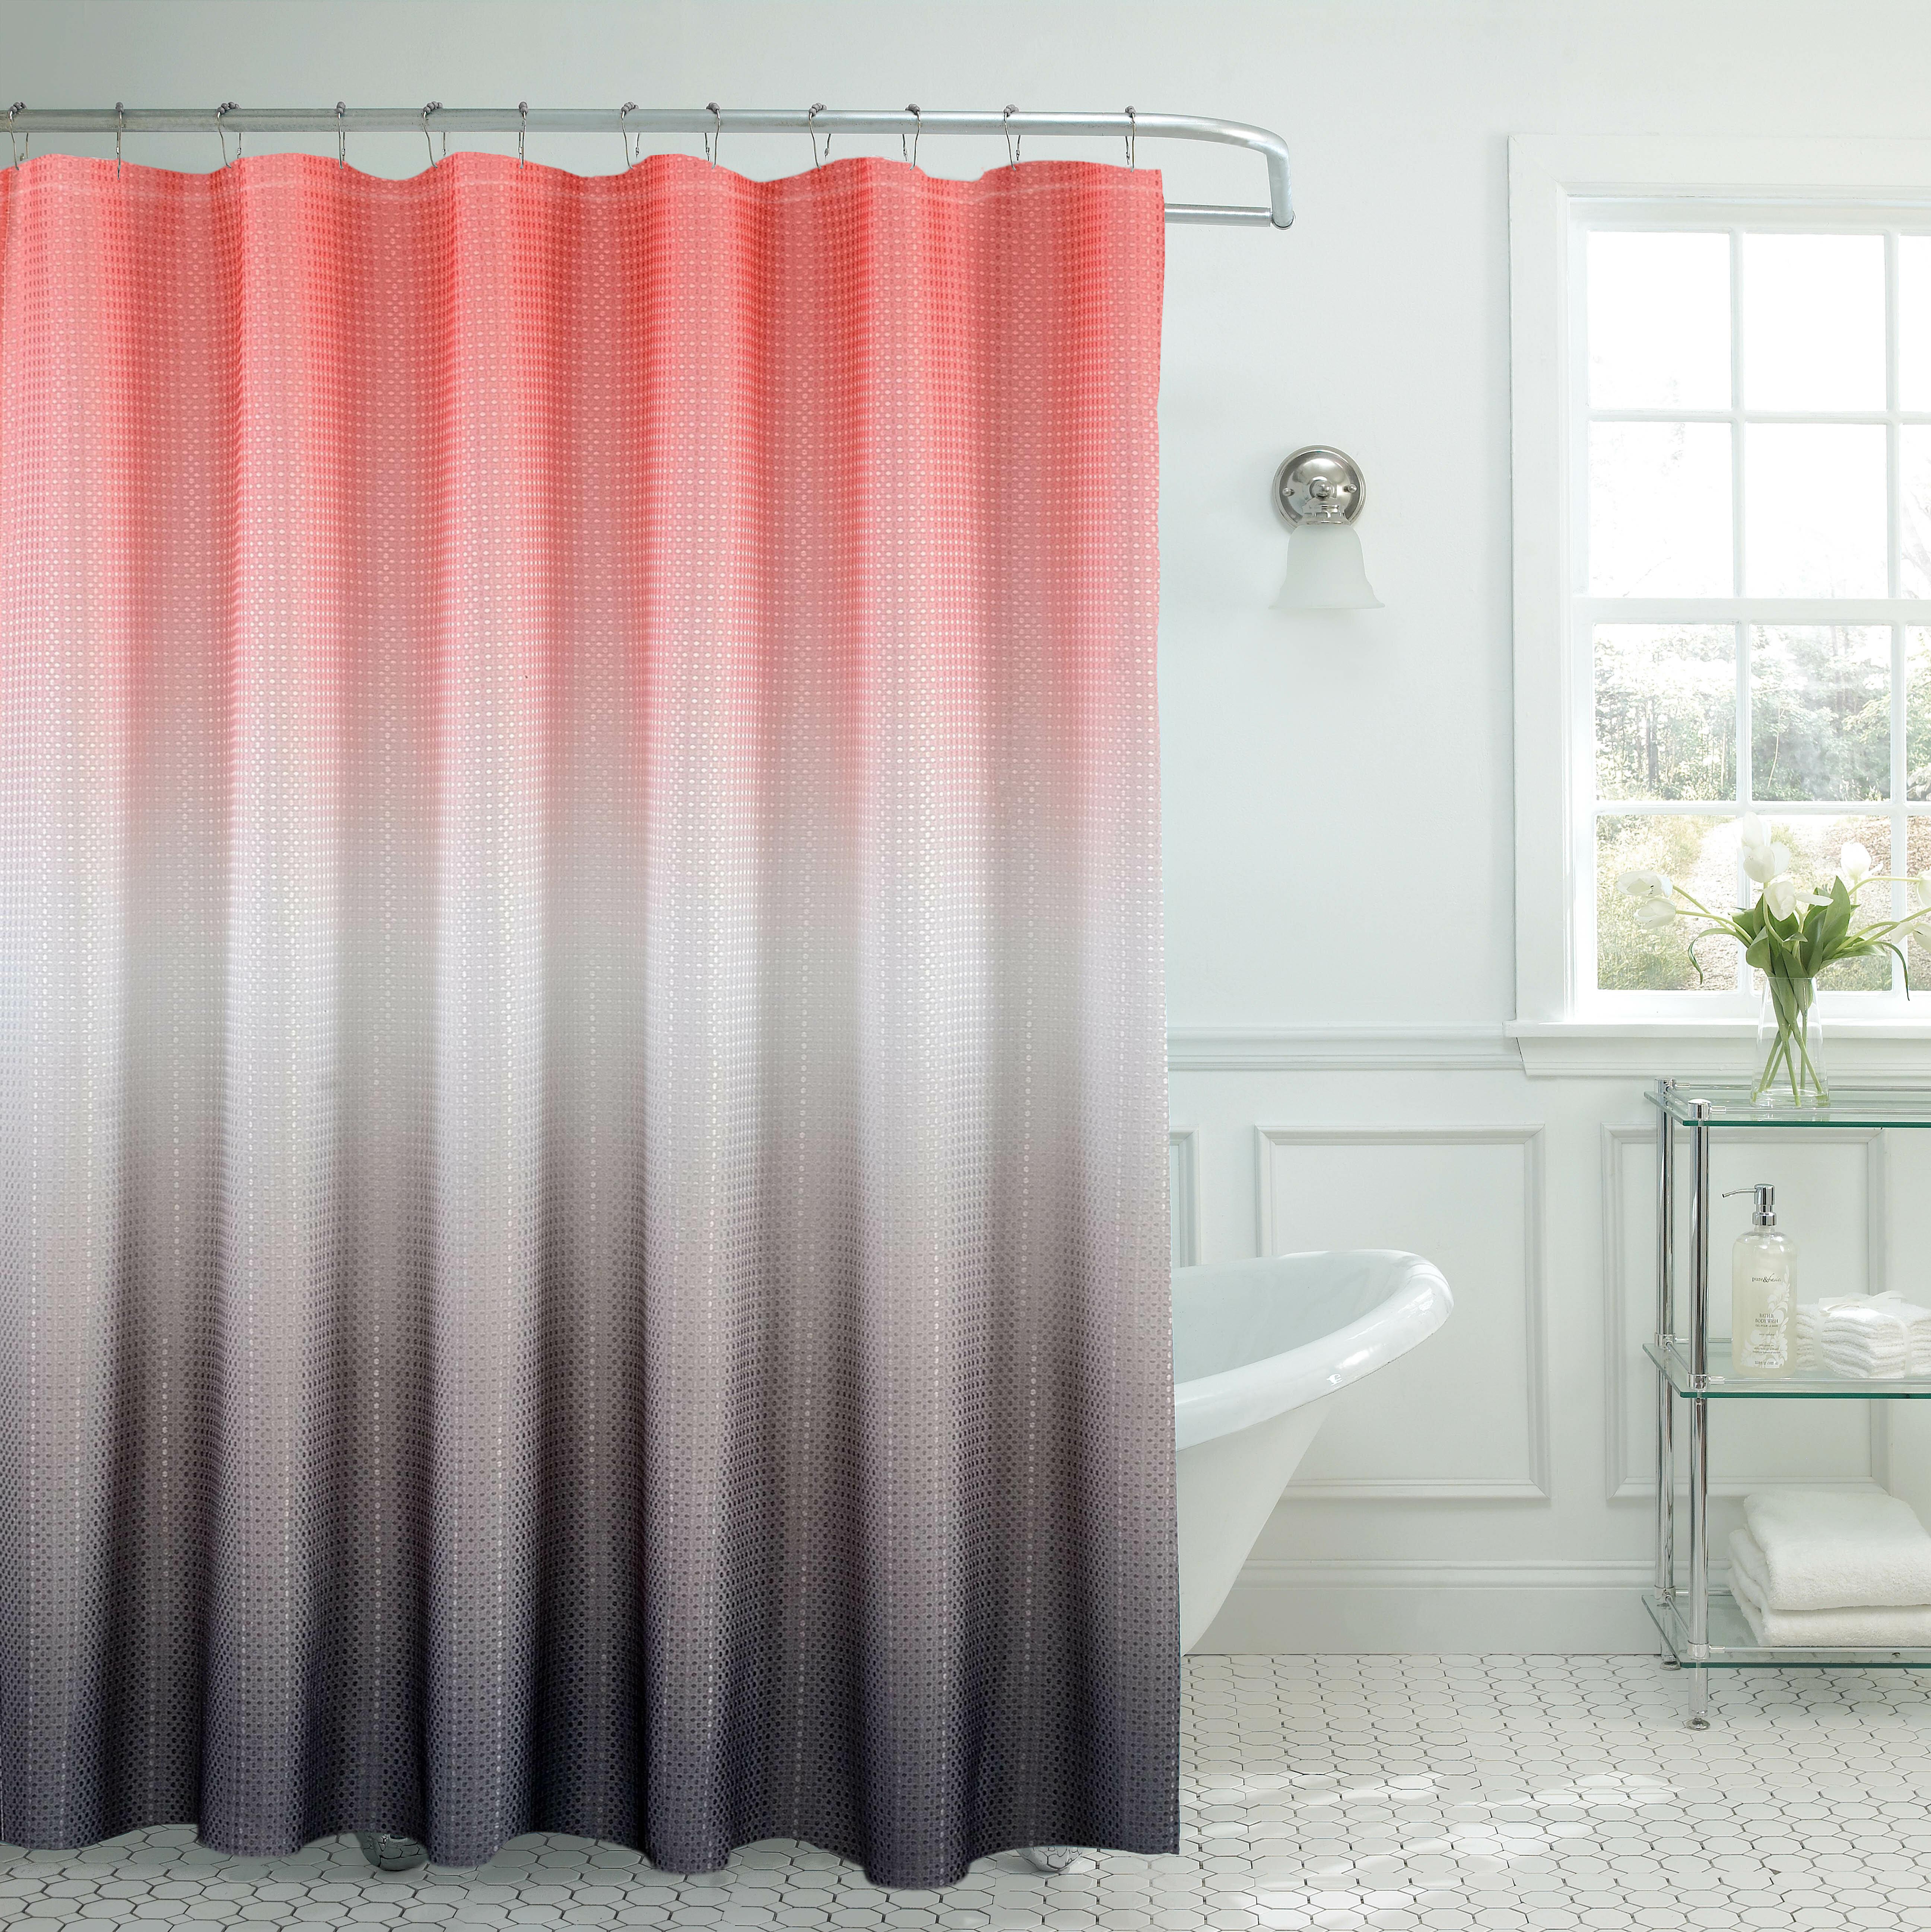 Bath Fusion Ombre Shower Curtain & Reviews | Wayfair